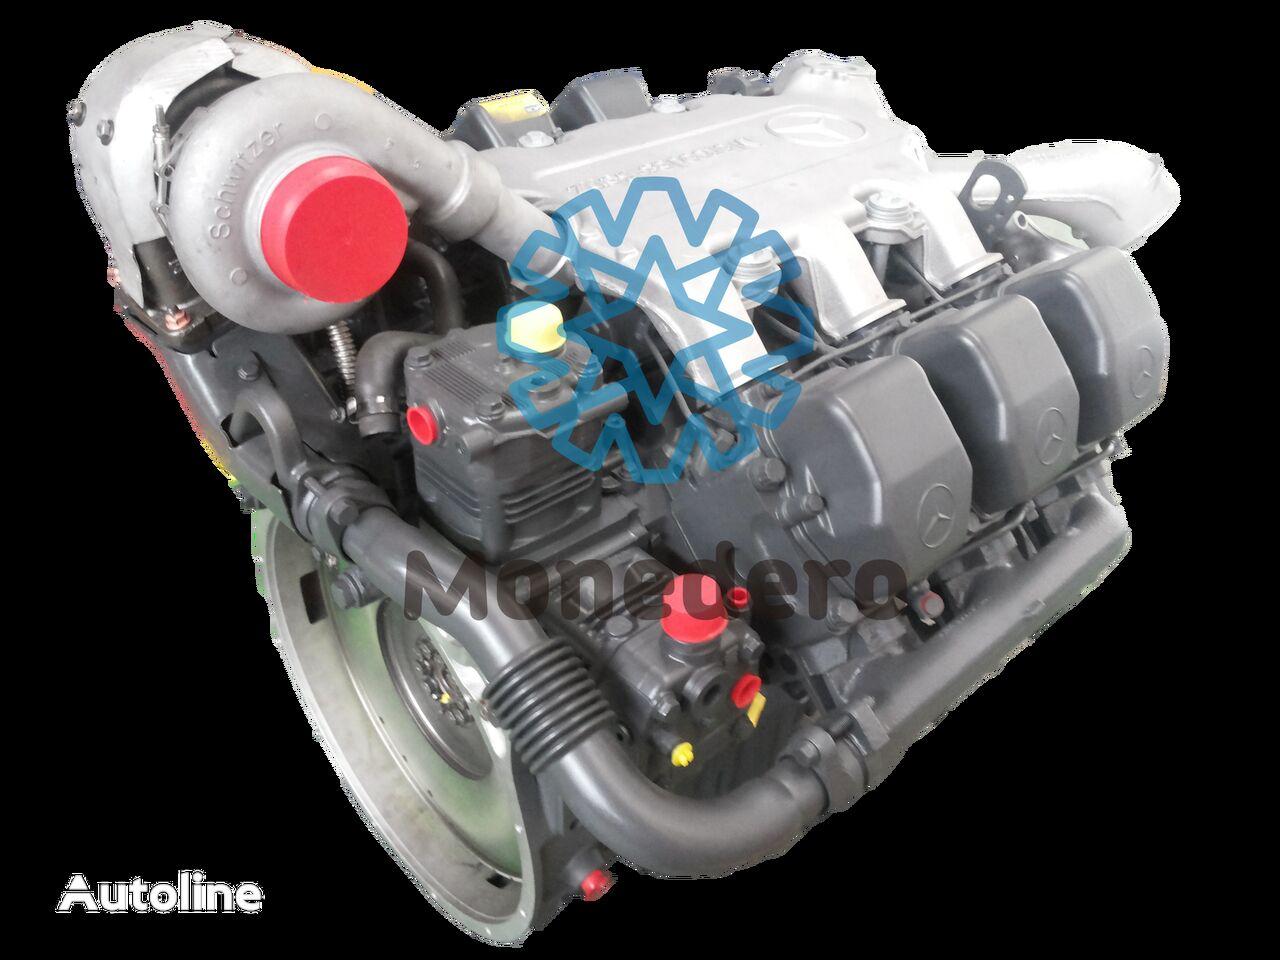 MERCEDES-BENZ OM 501 LA motor pentru camion